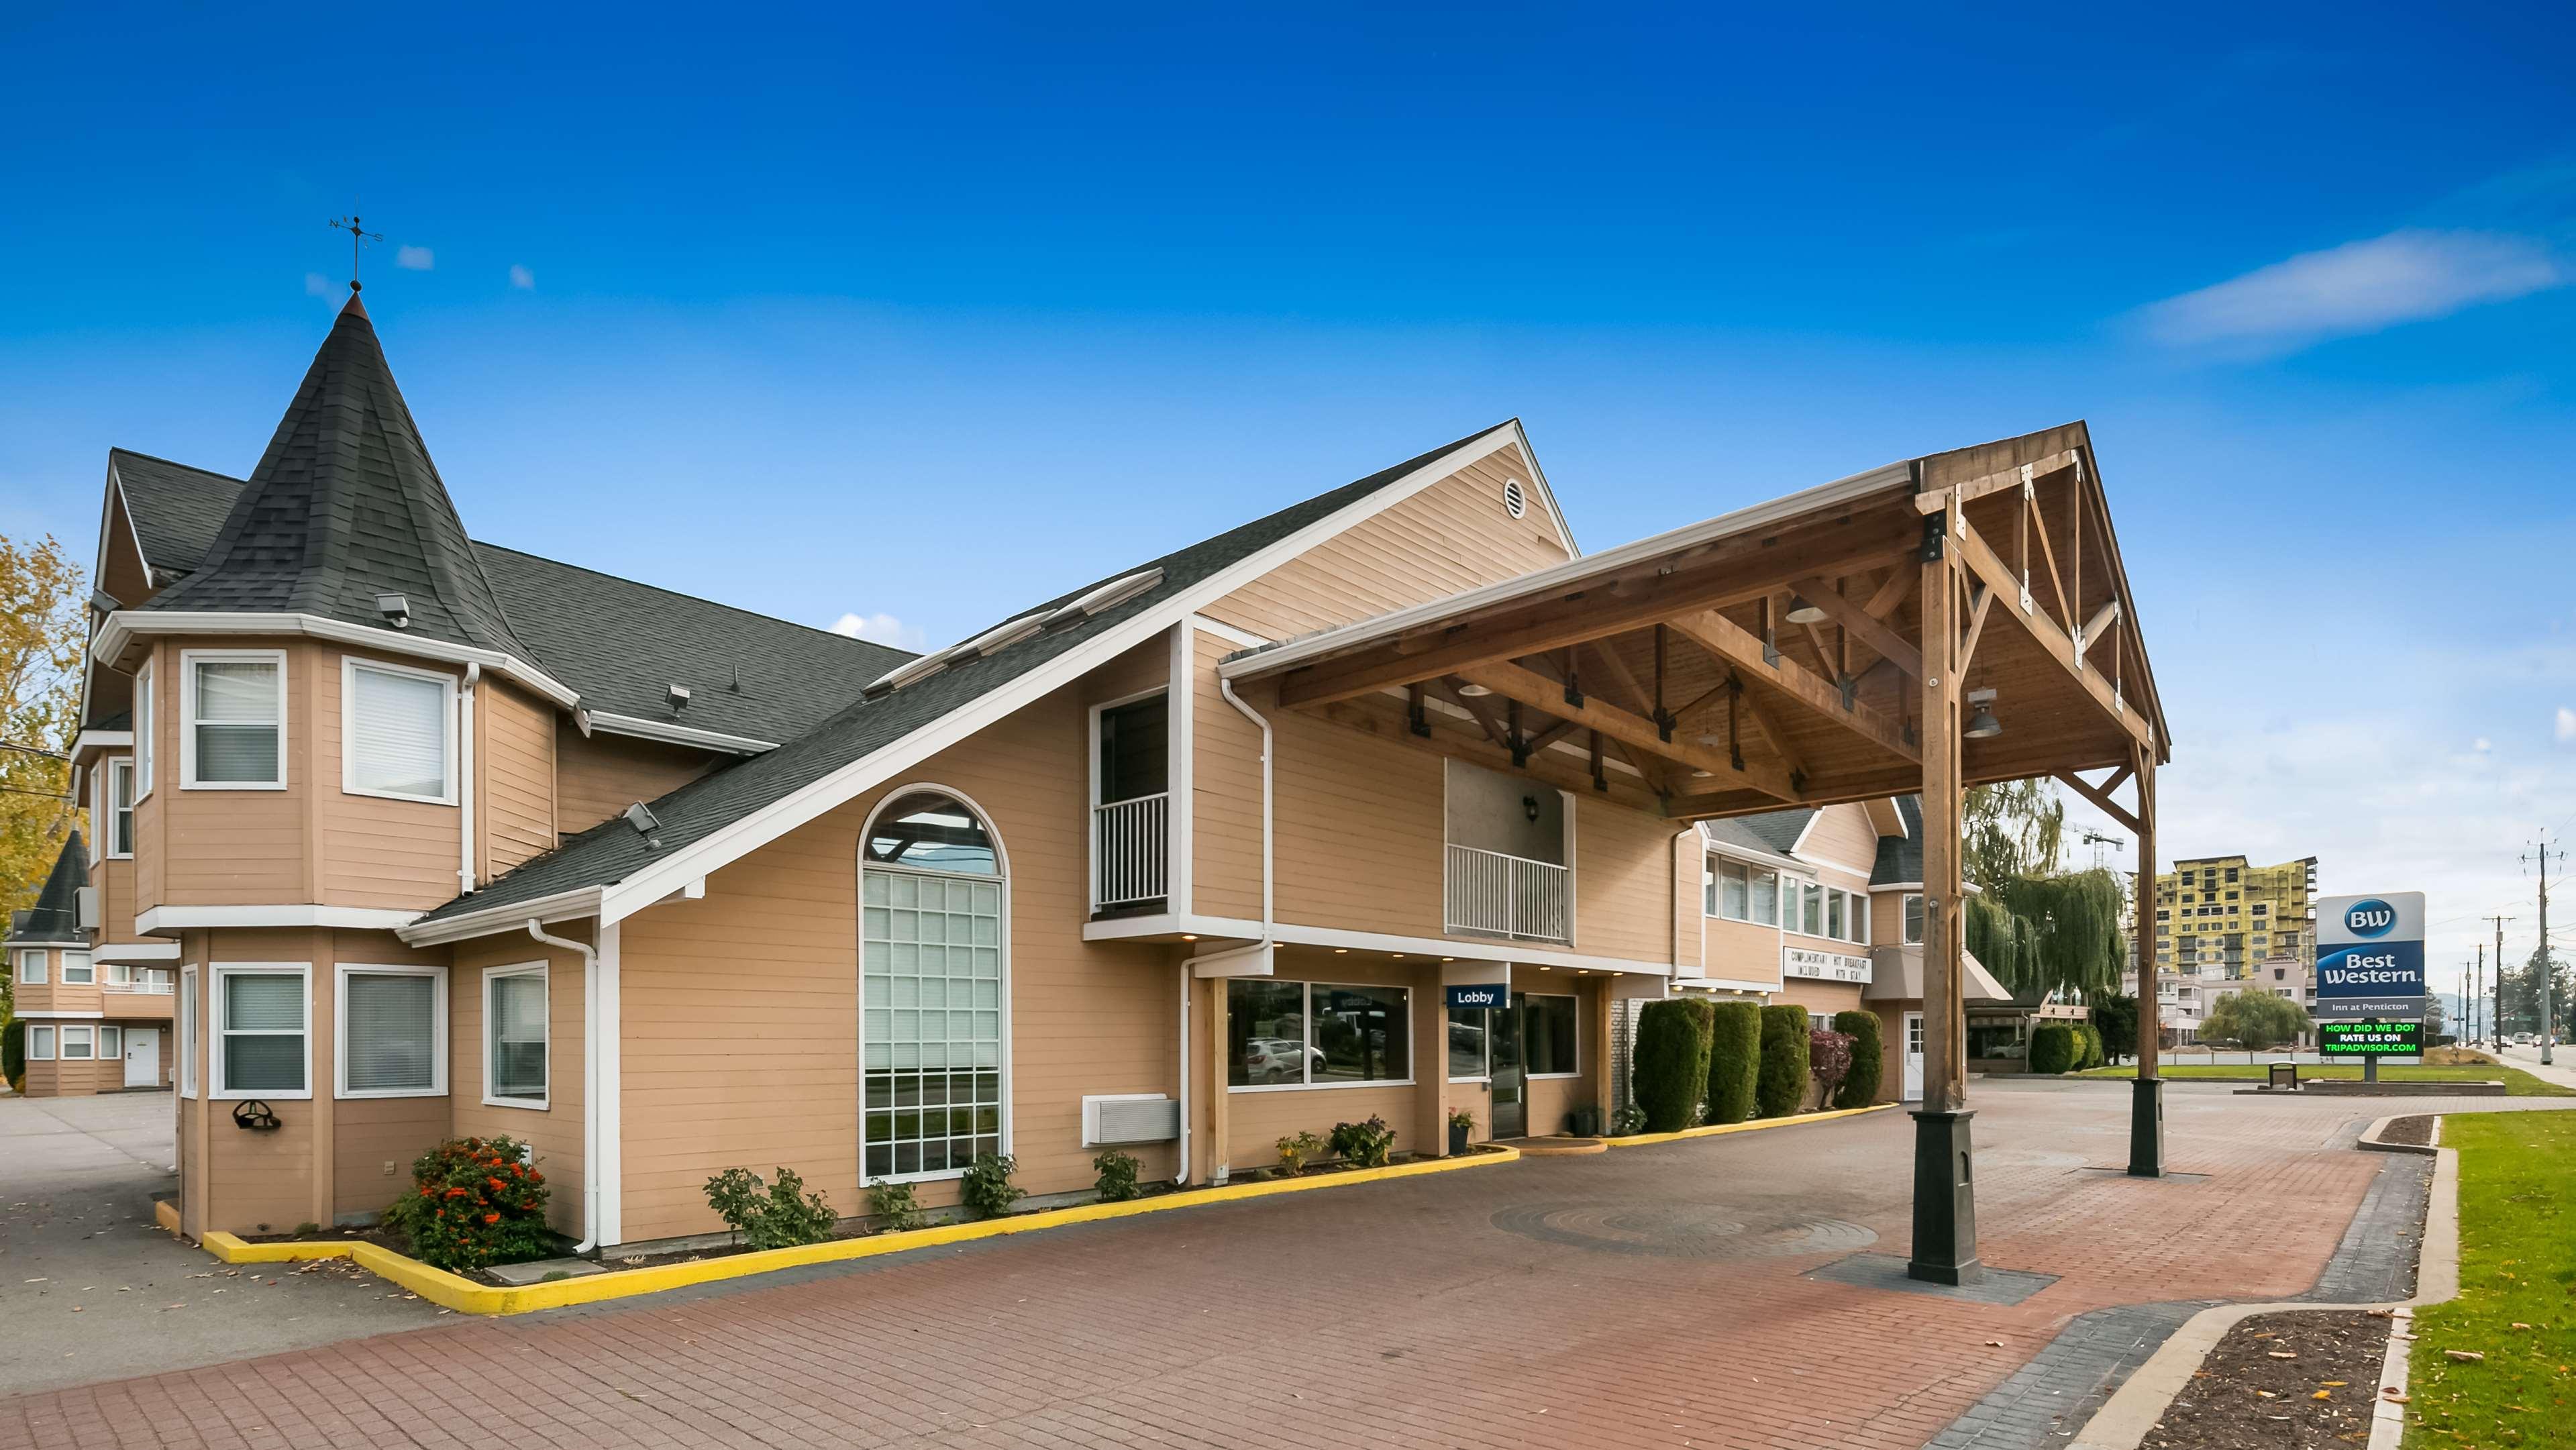 Best Western Hotel Penticton